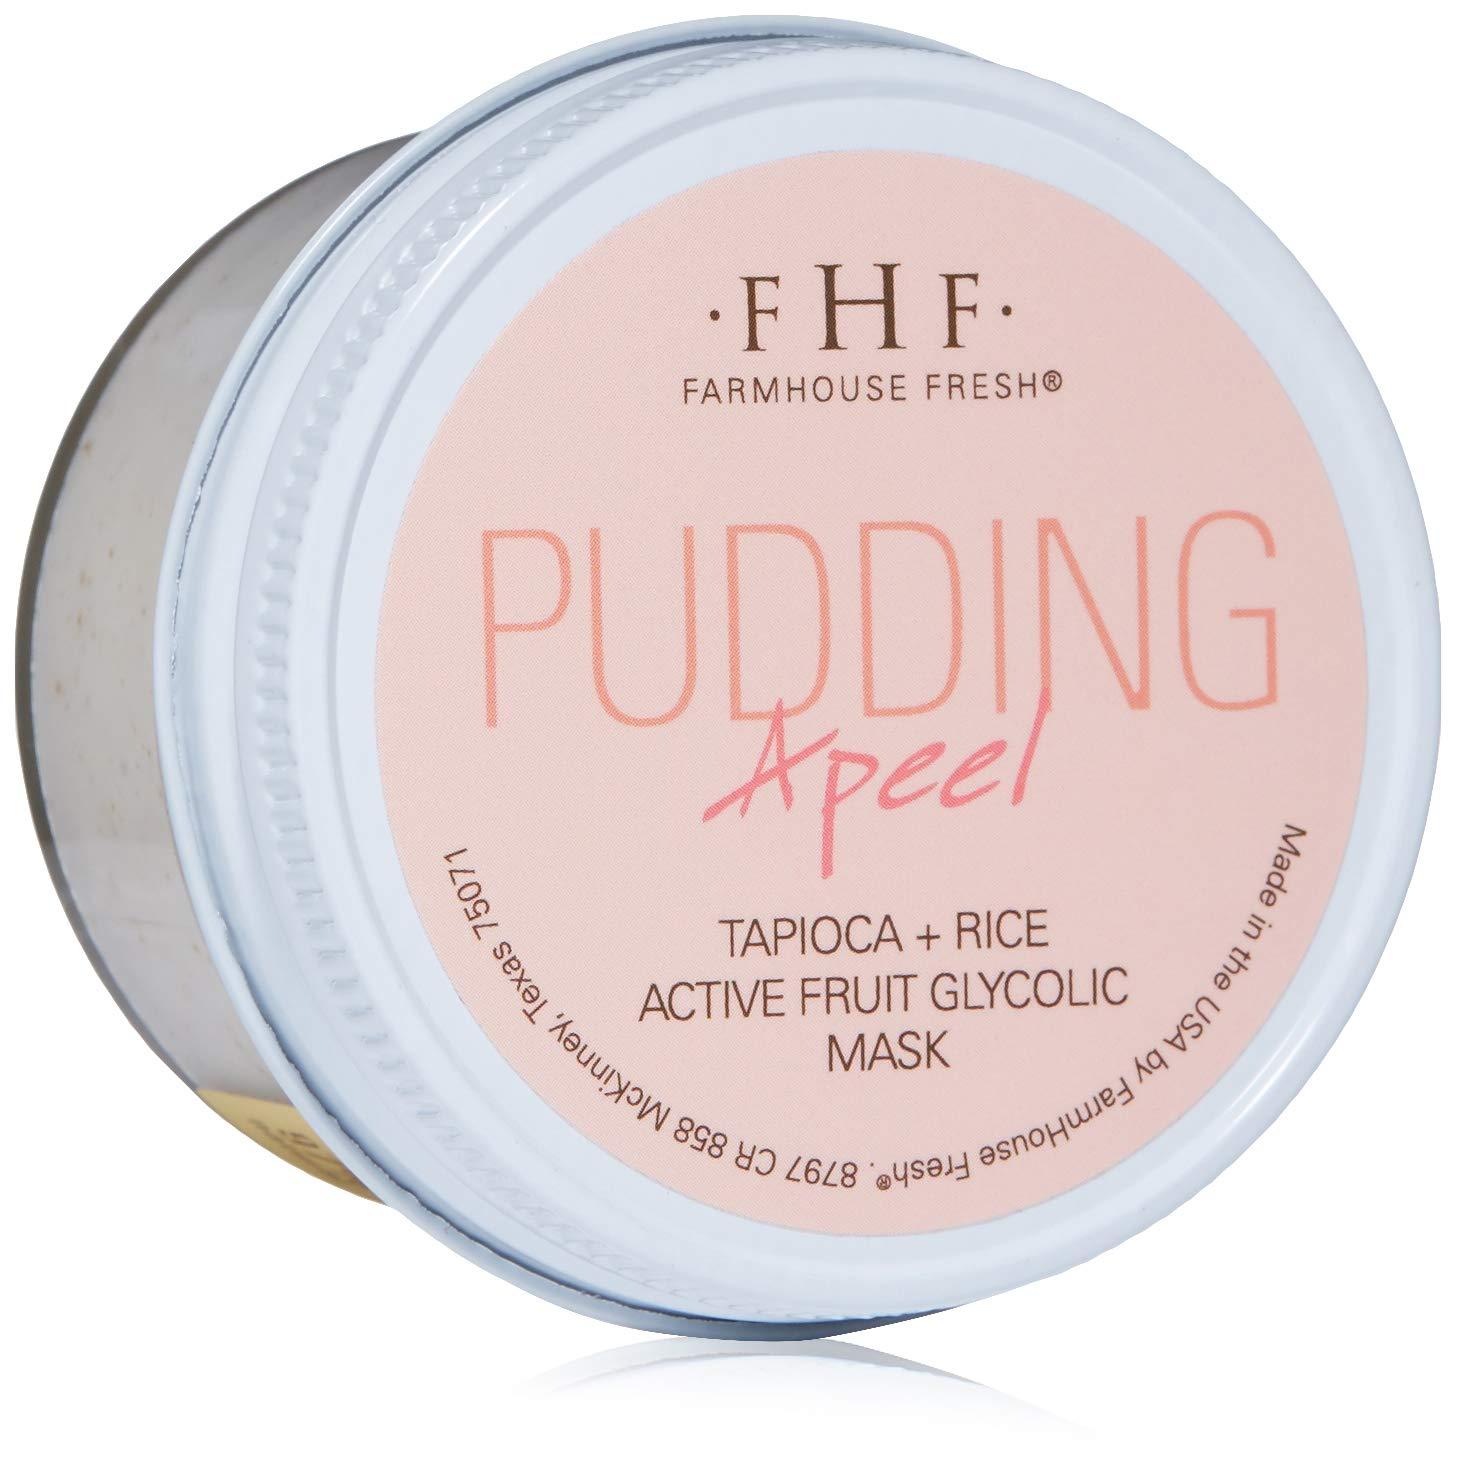 FarmHouse Fresh Pudding Apeel Tapioca Rice Active Fruit Glycolic Mask, 3.2 Fl Oz